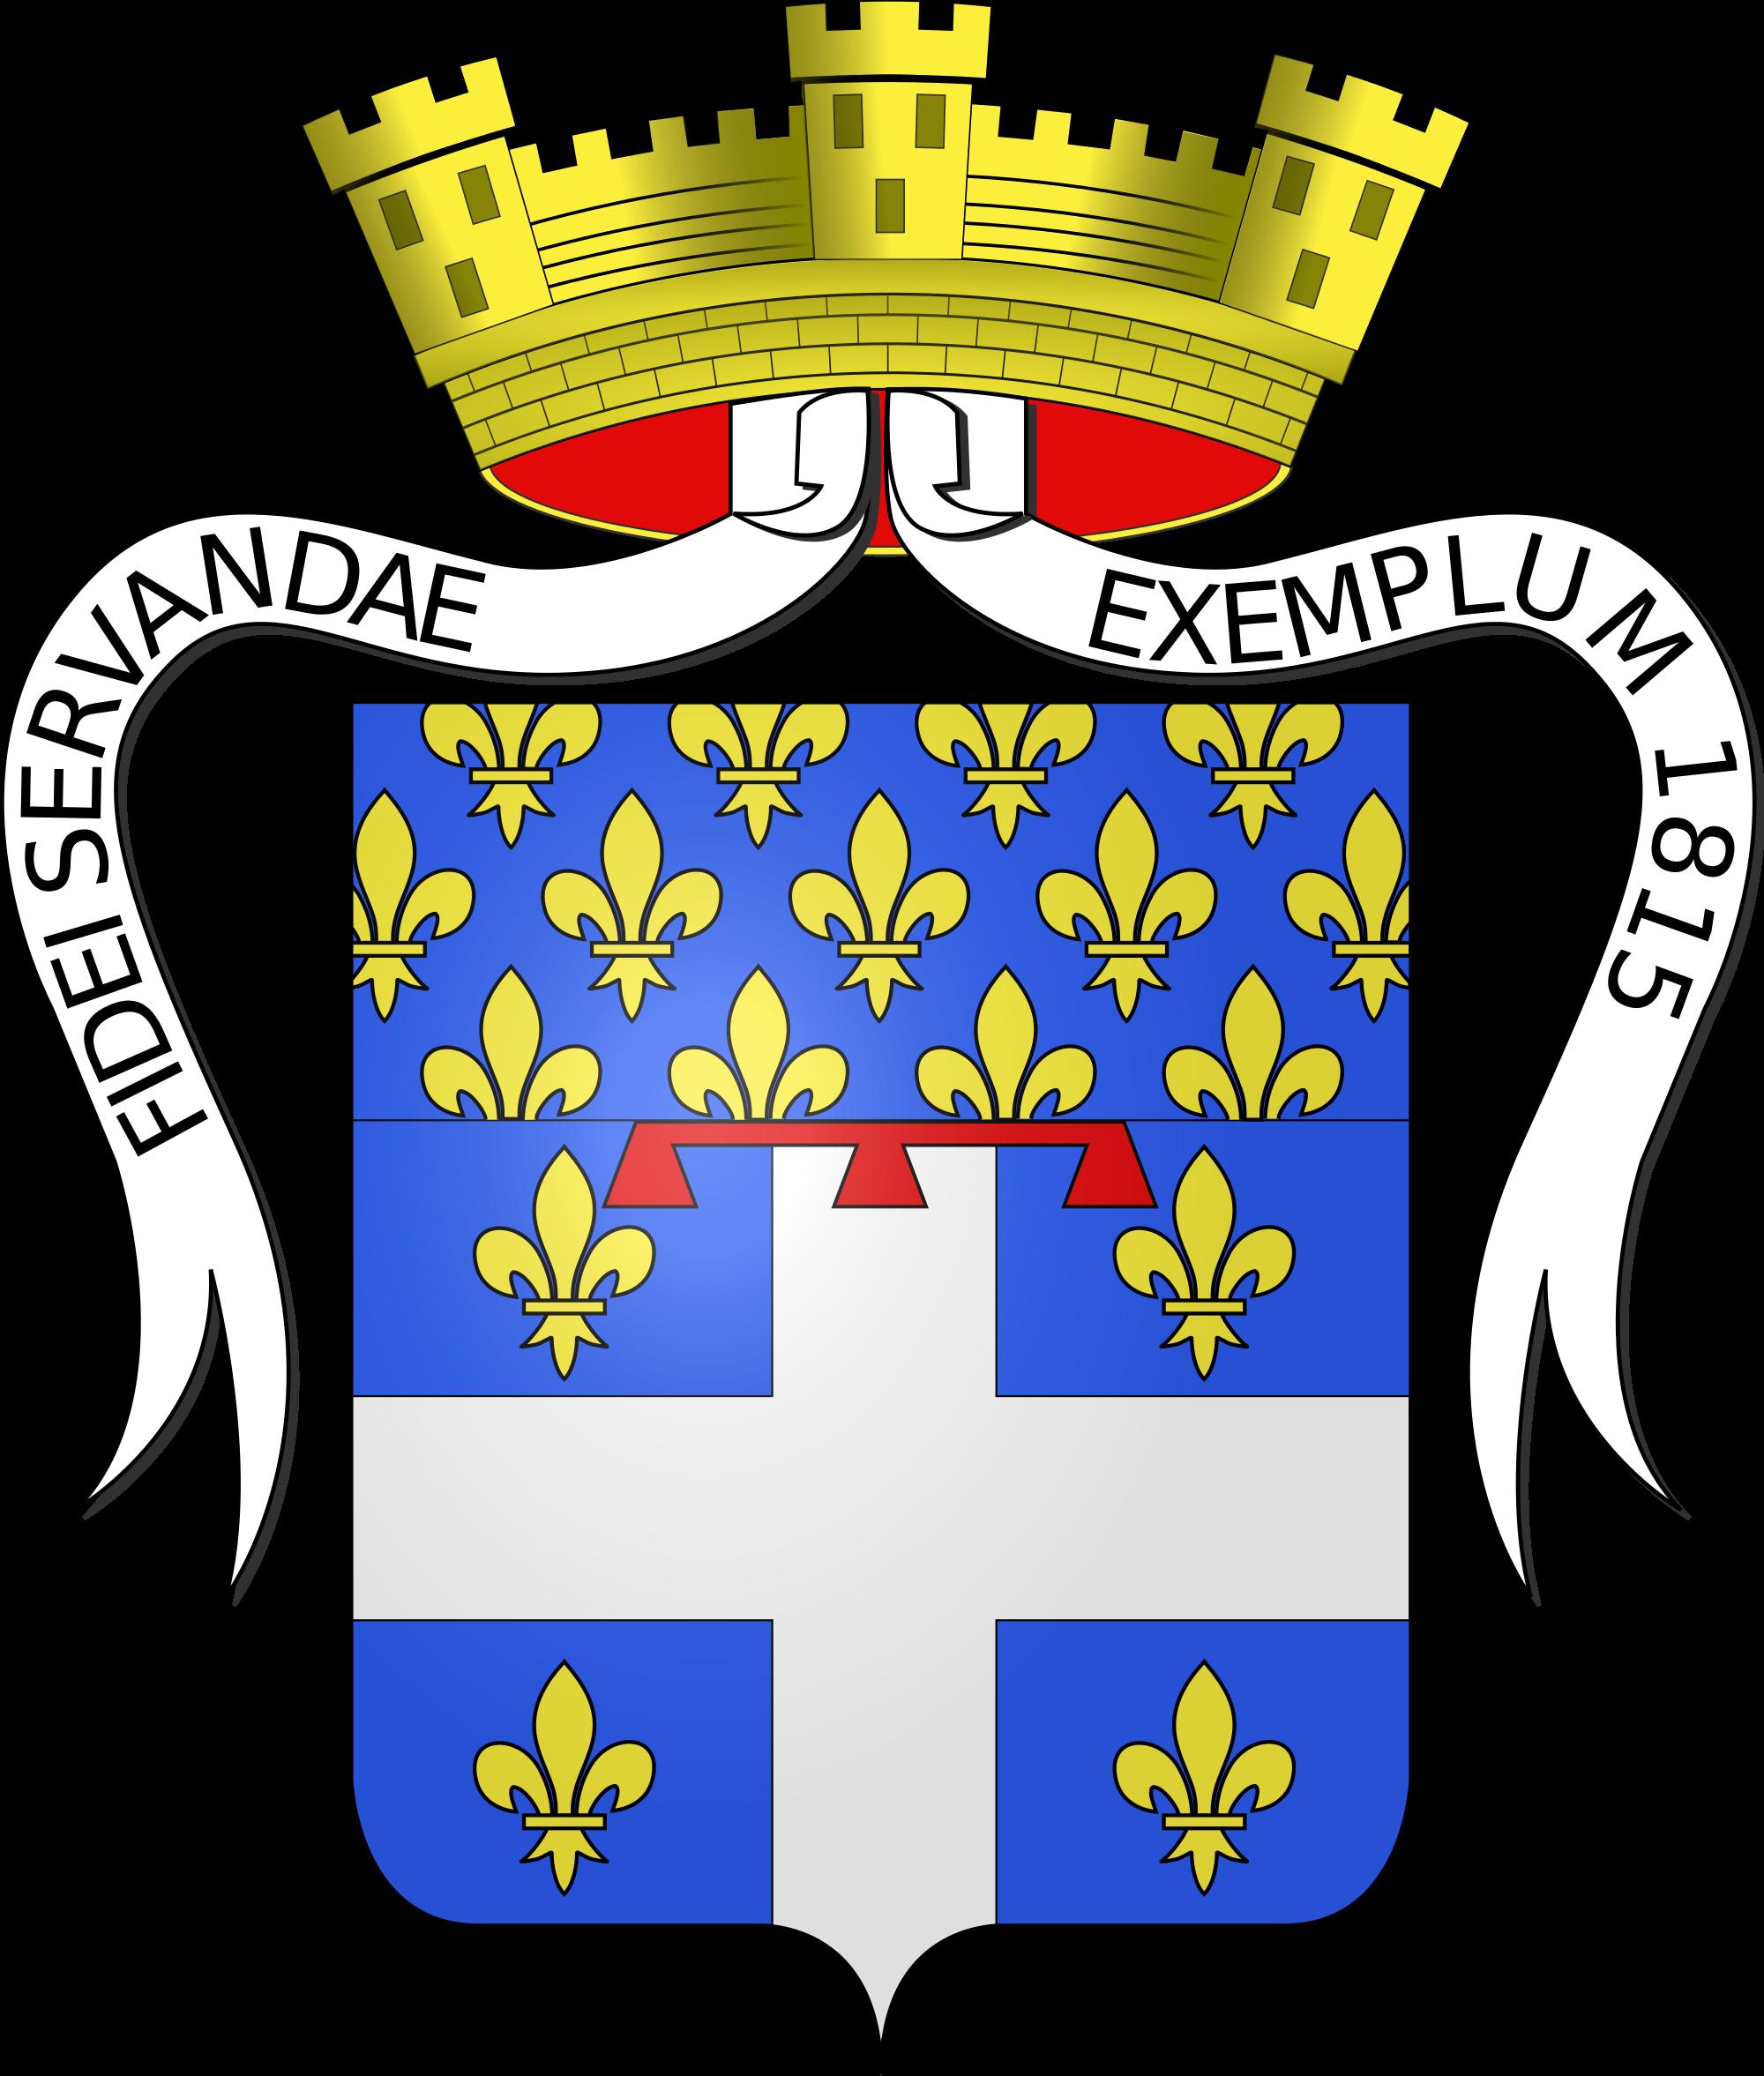 File:Armoirie ville fr Antibes.svg.